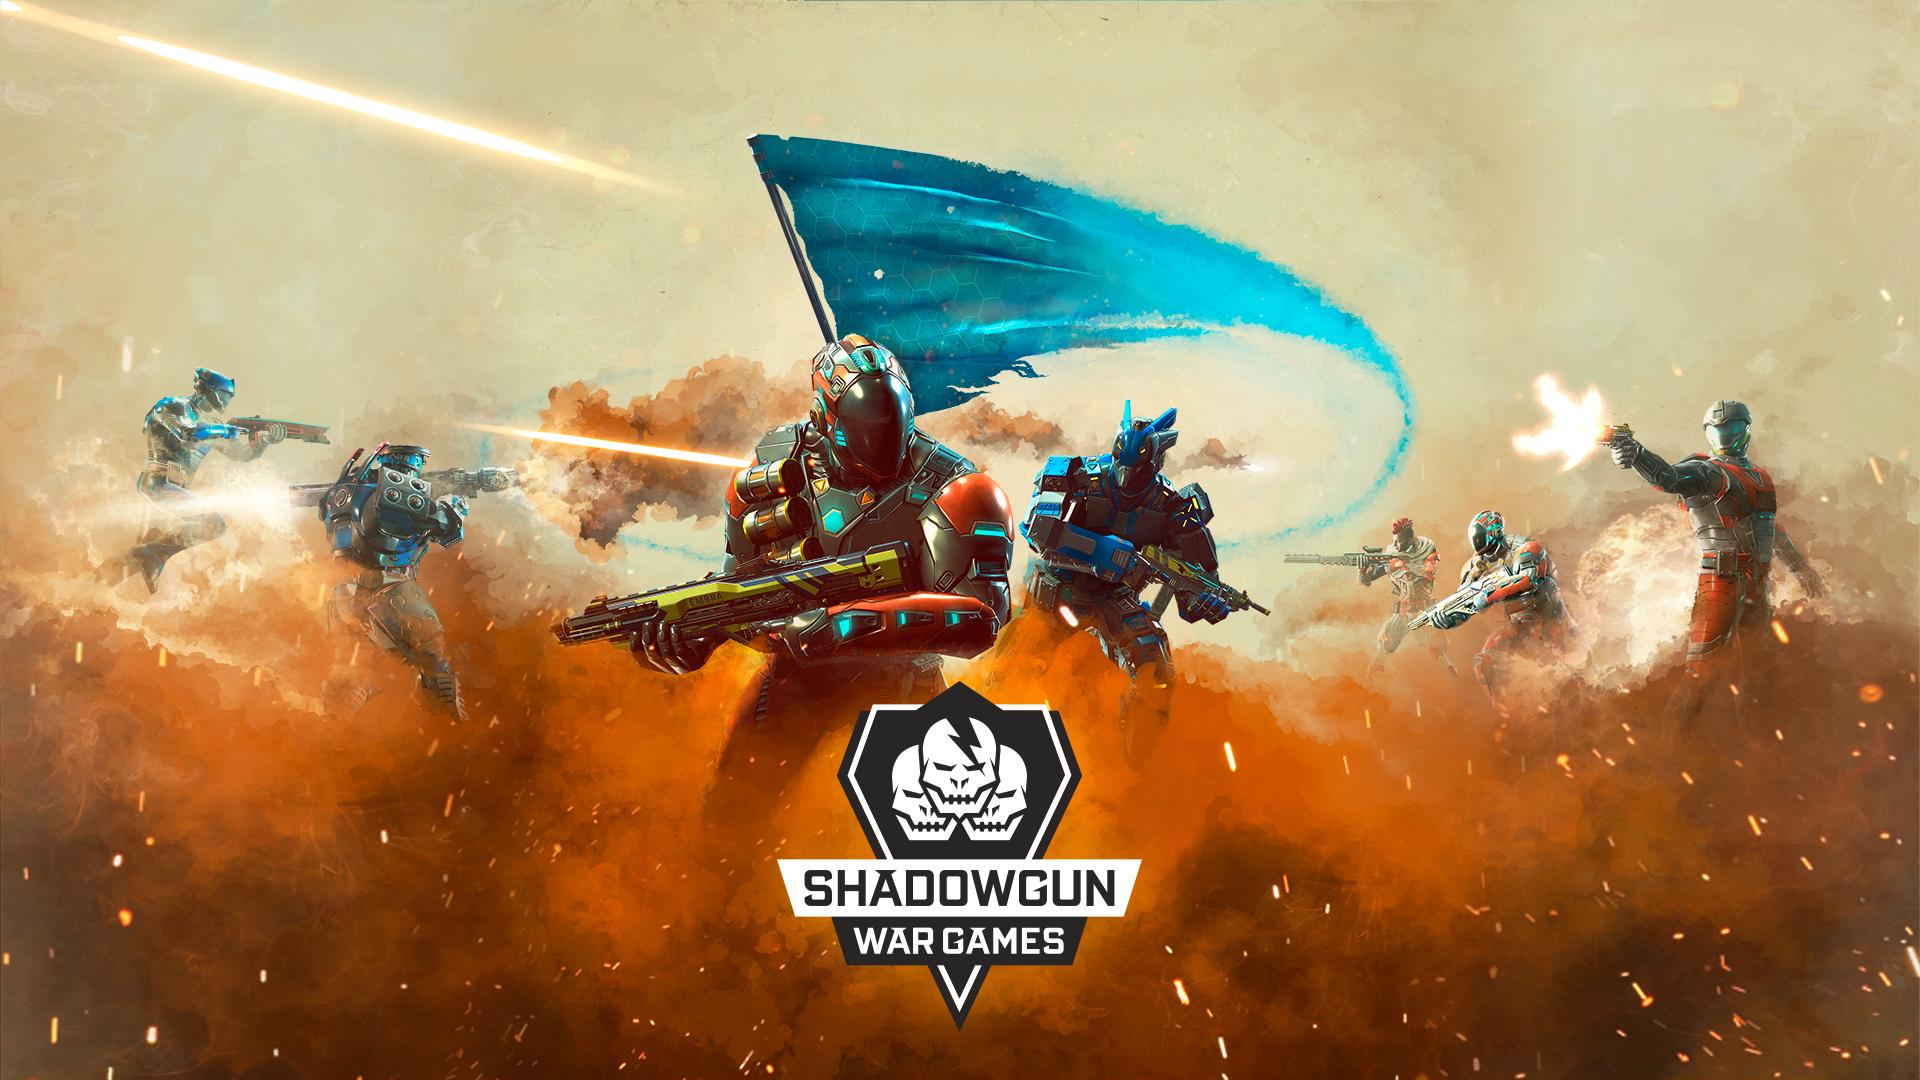 Shadowgun War Games está em pré-registro no Android, no Google Play